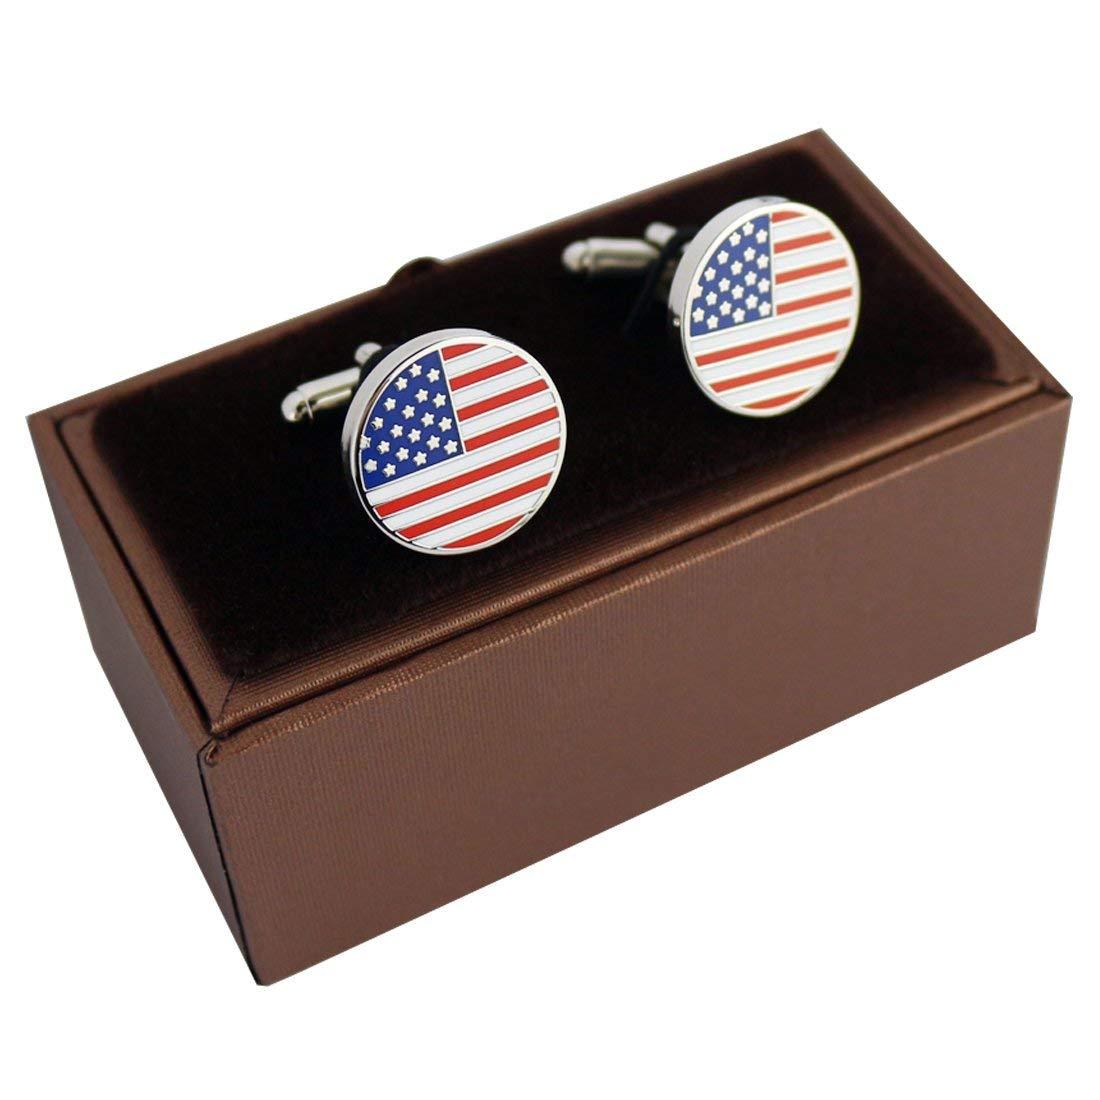 PINMEI American Flag Cufflinks Enamel Round Pair Great Gift for Men